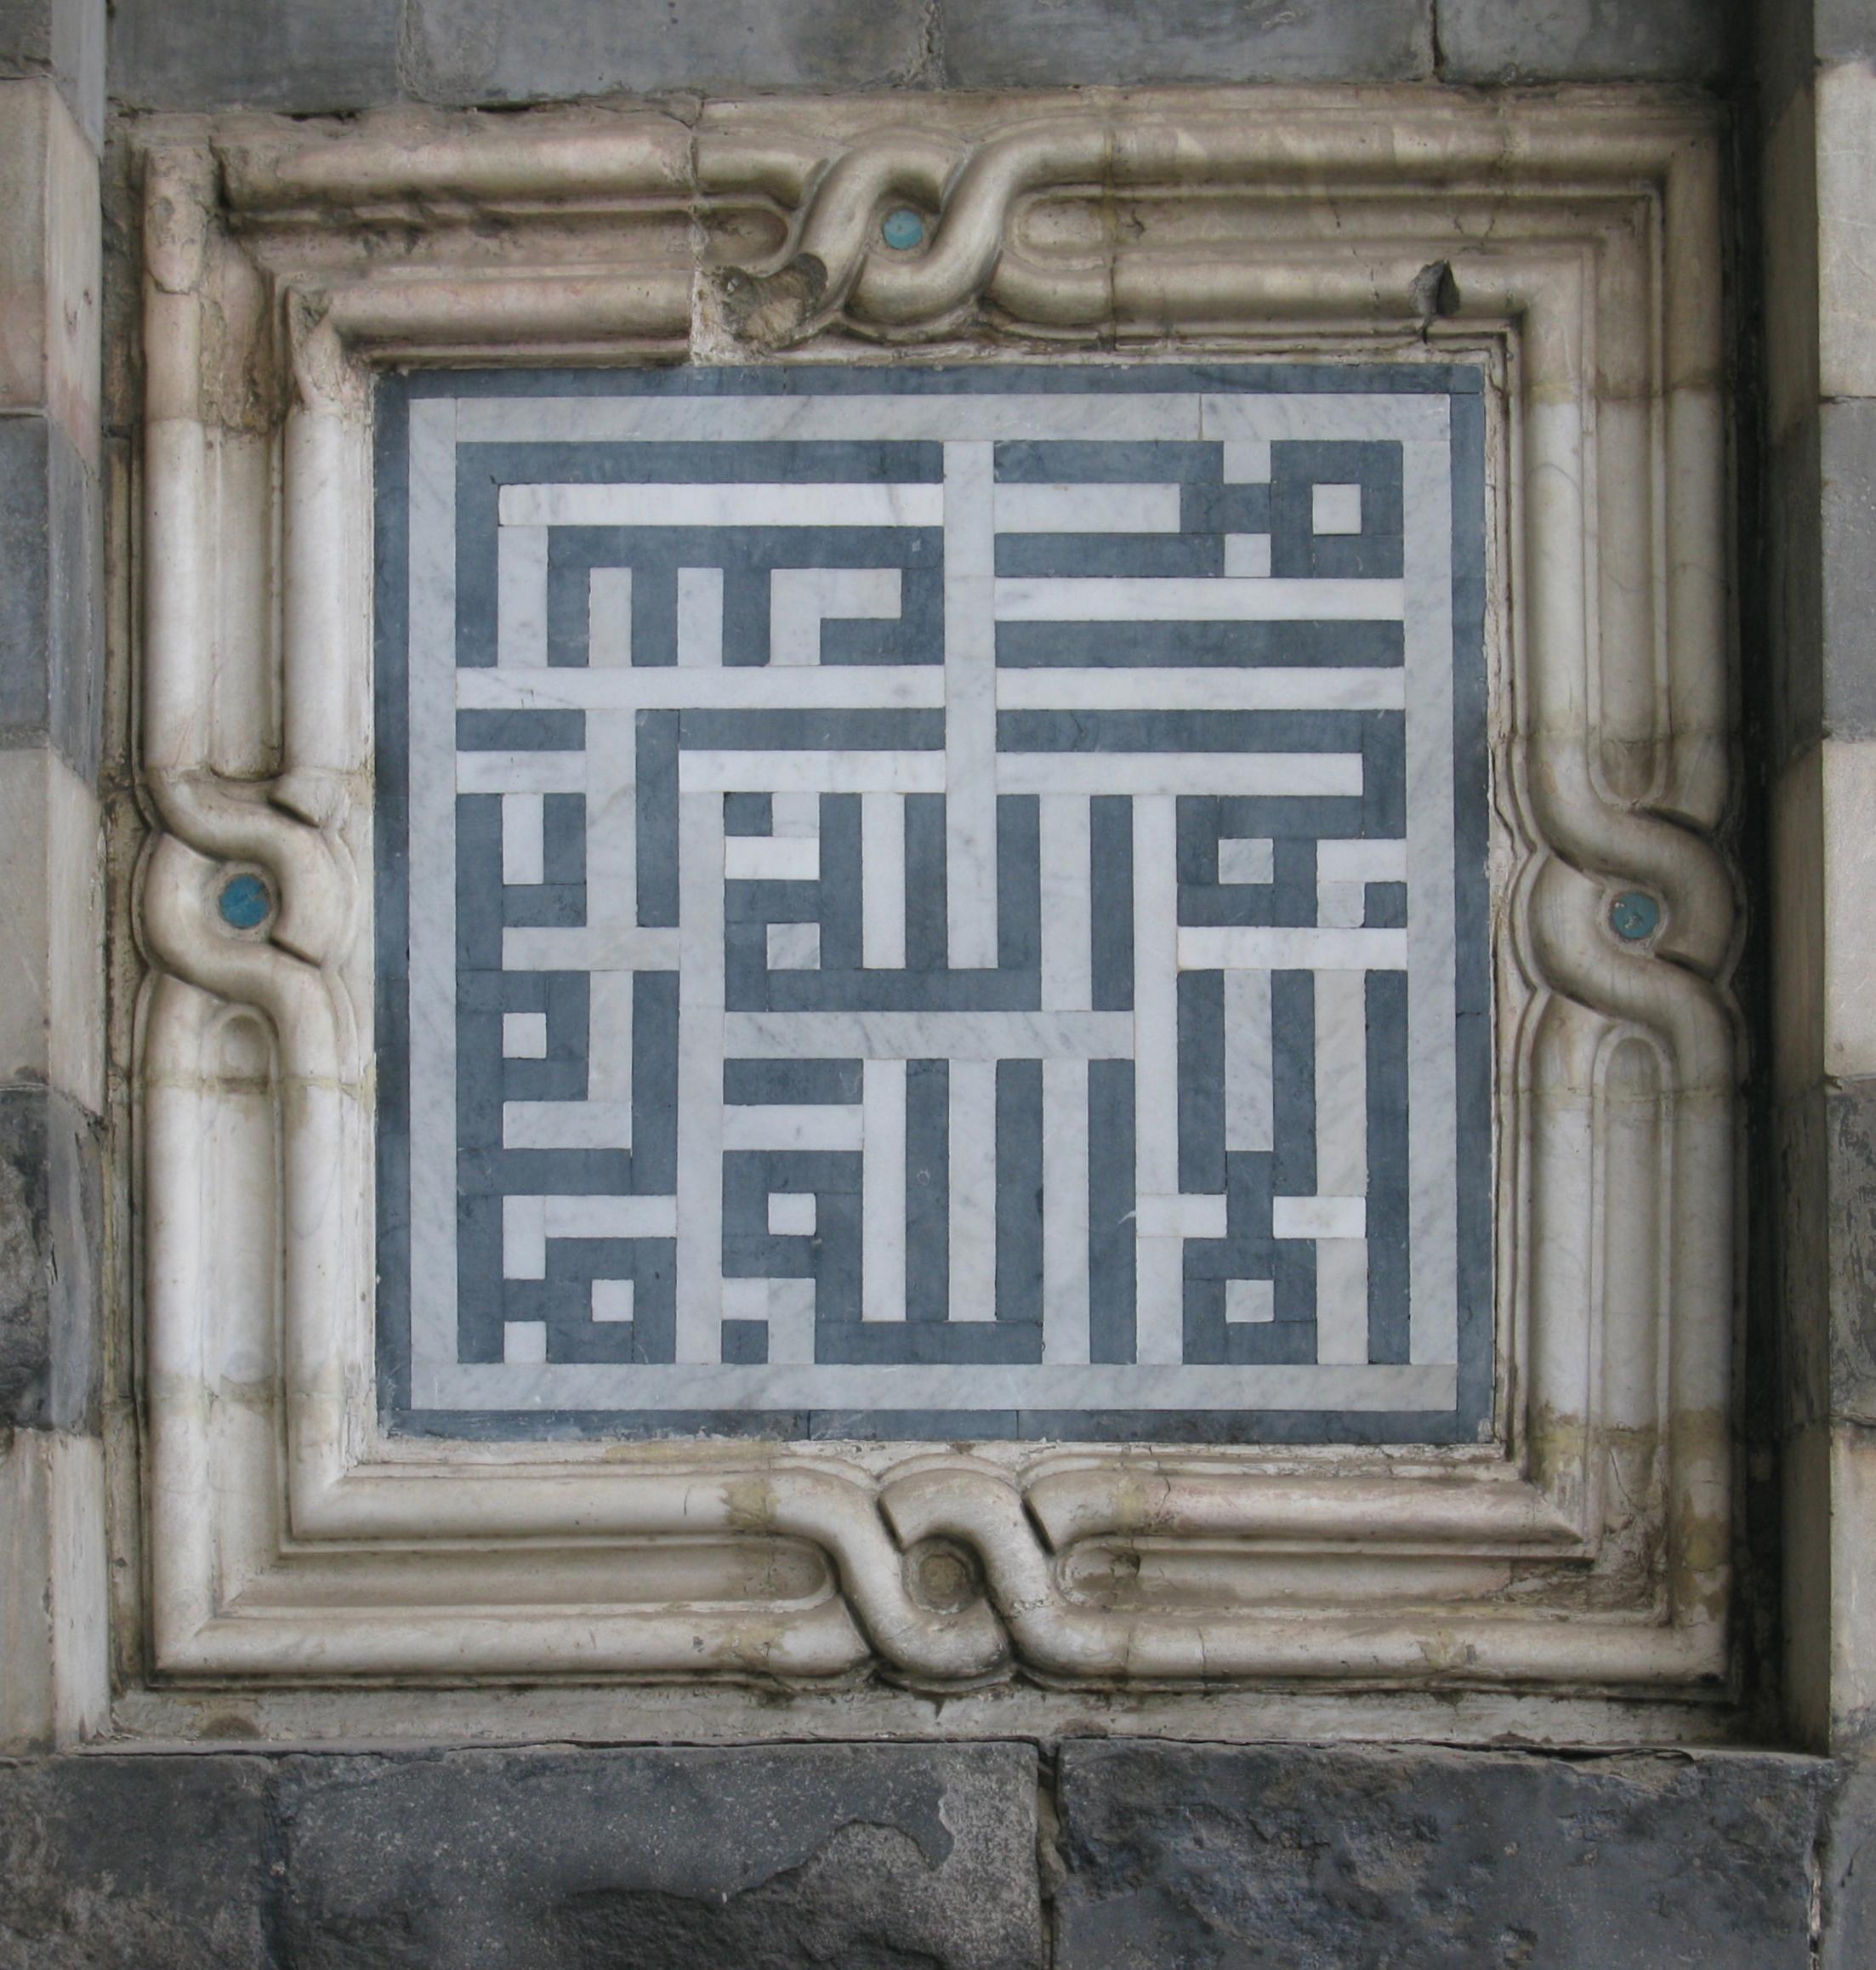 Entrance portal inscription, Mosque of al-Mu'ayyad Shaykh, Cairo (Photograph: Peter Webb under CC BY-NC-SA 4.0)